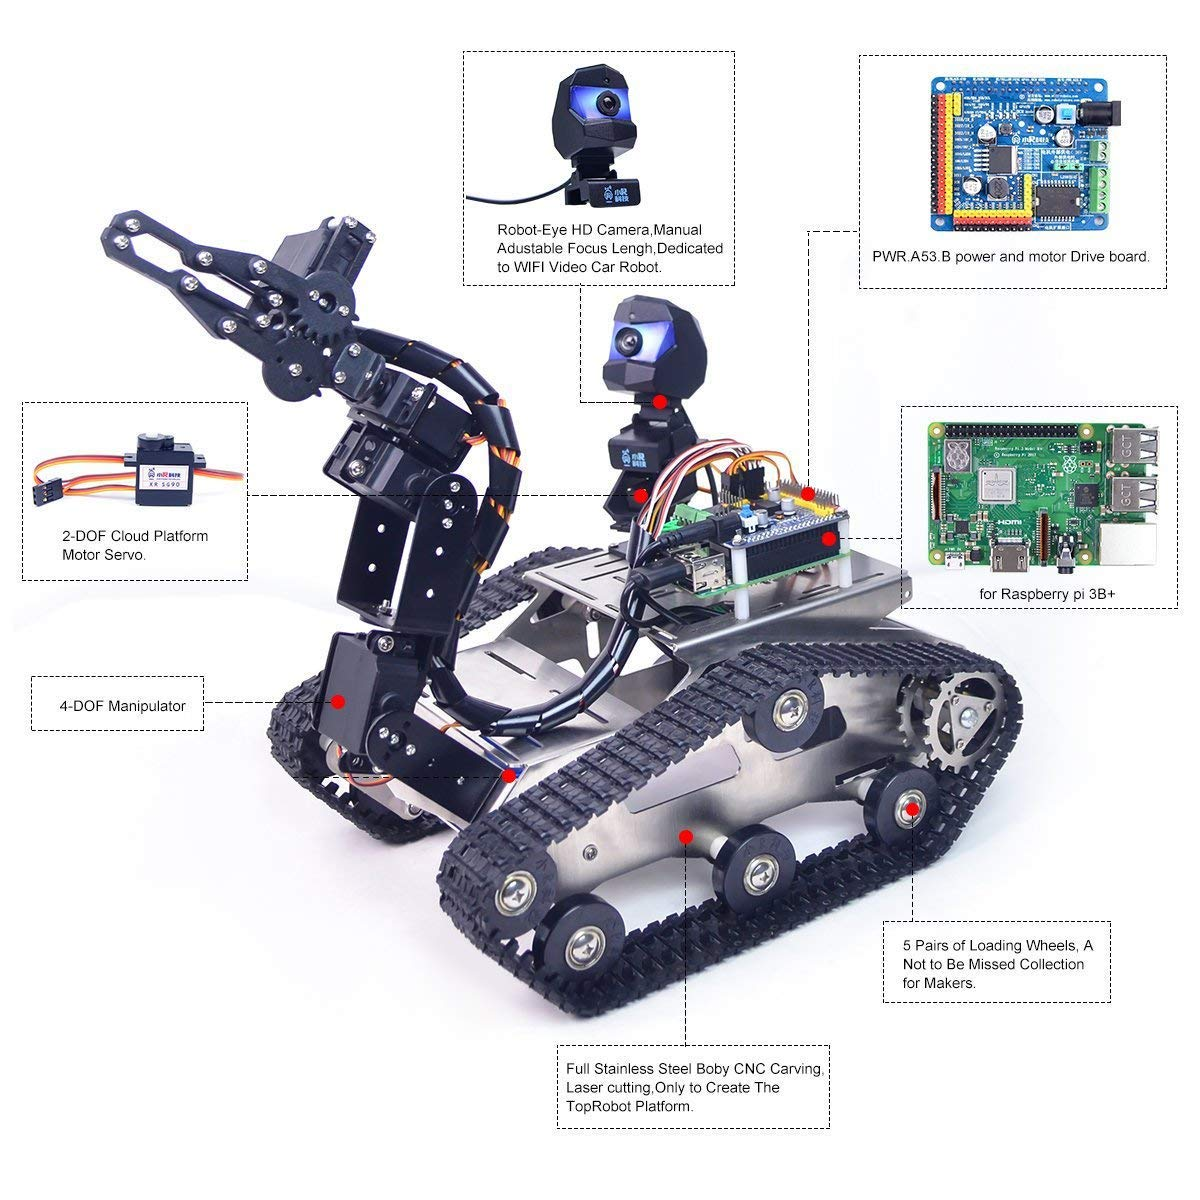 Amazon com: WiFi Smart Robot Car Kit for Raspberry Pi 3B+